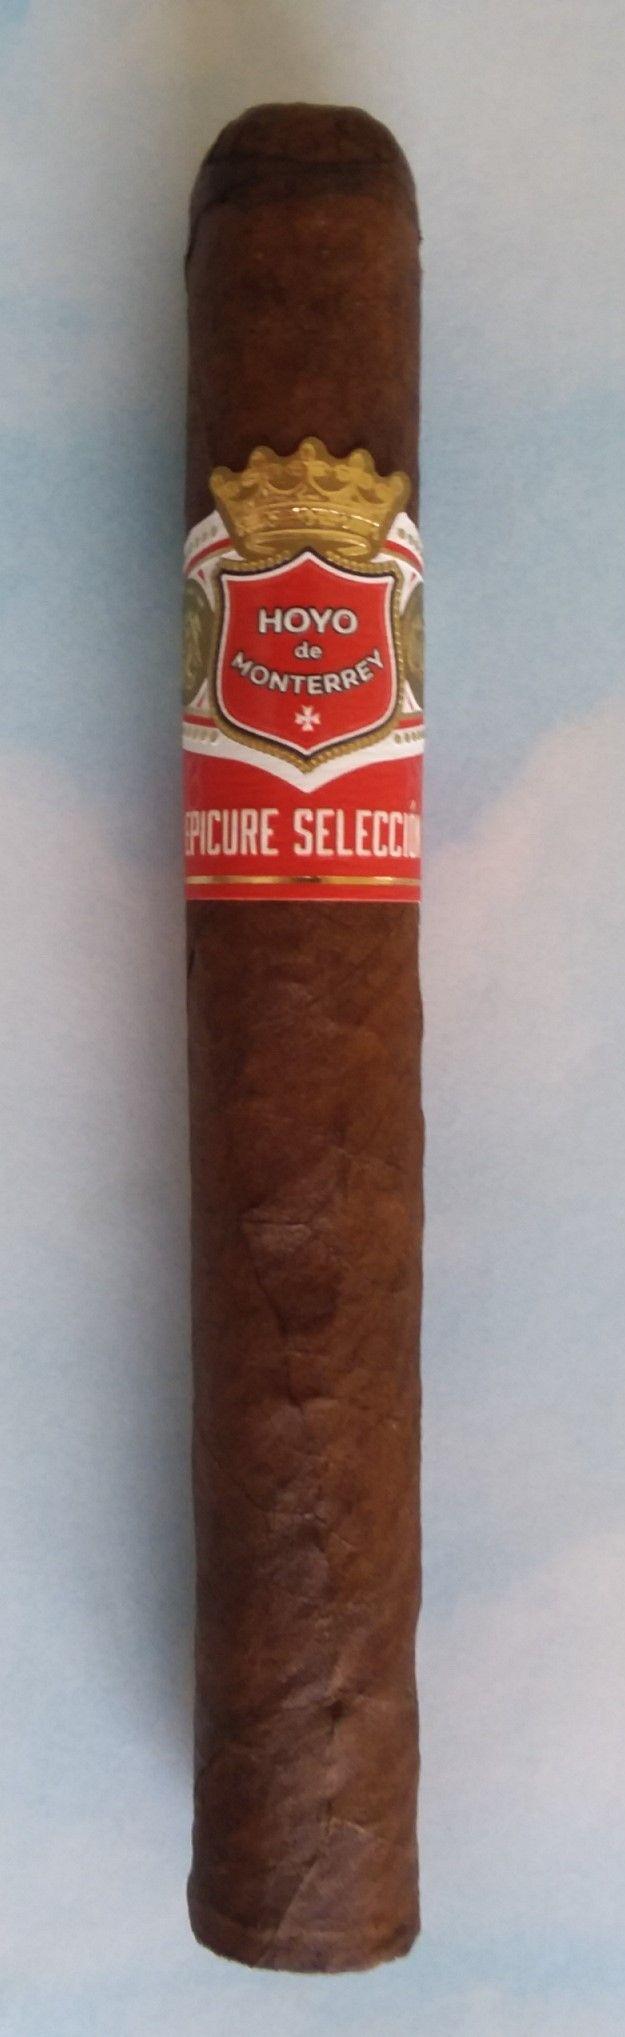 Hoyo Epicure Seleccion Cigar